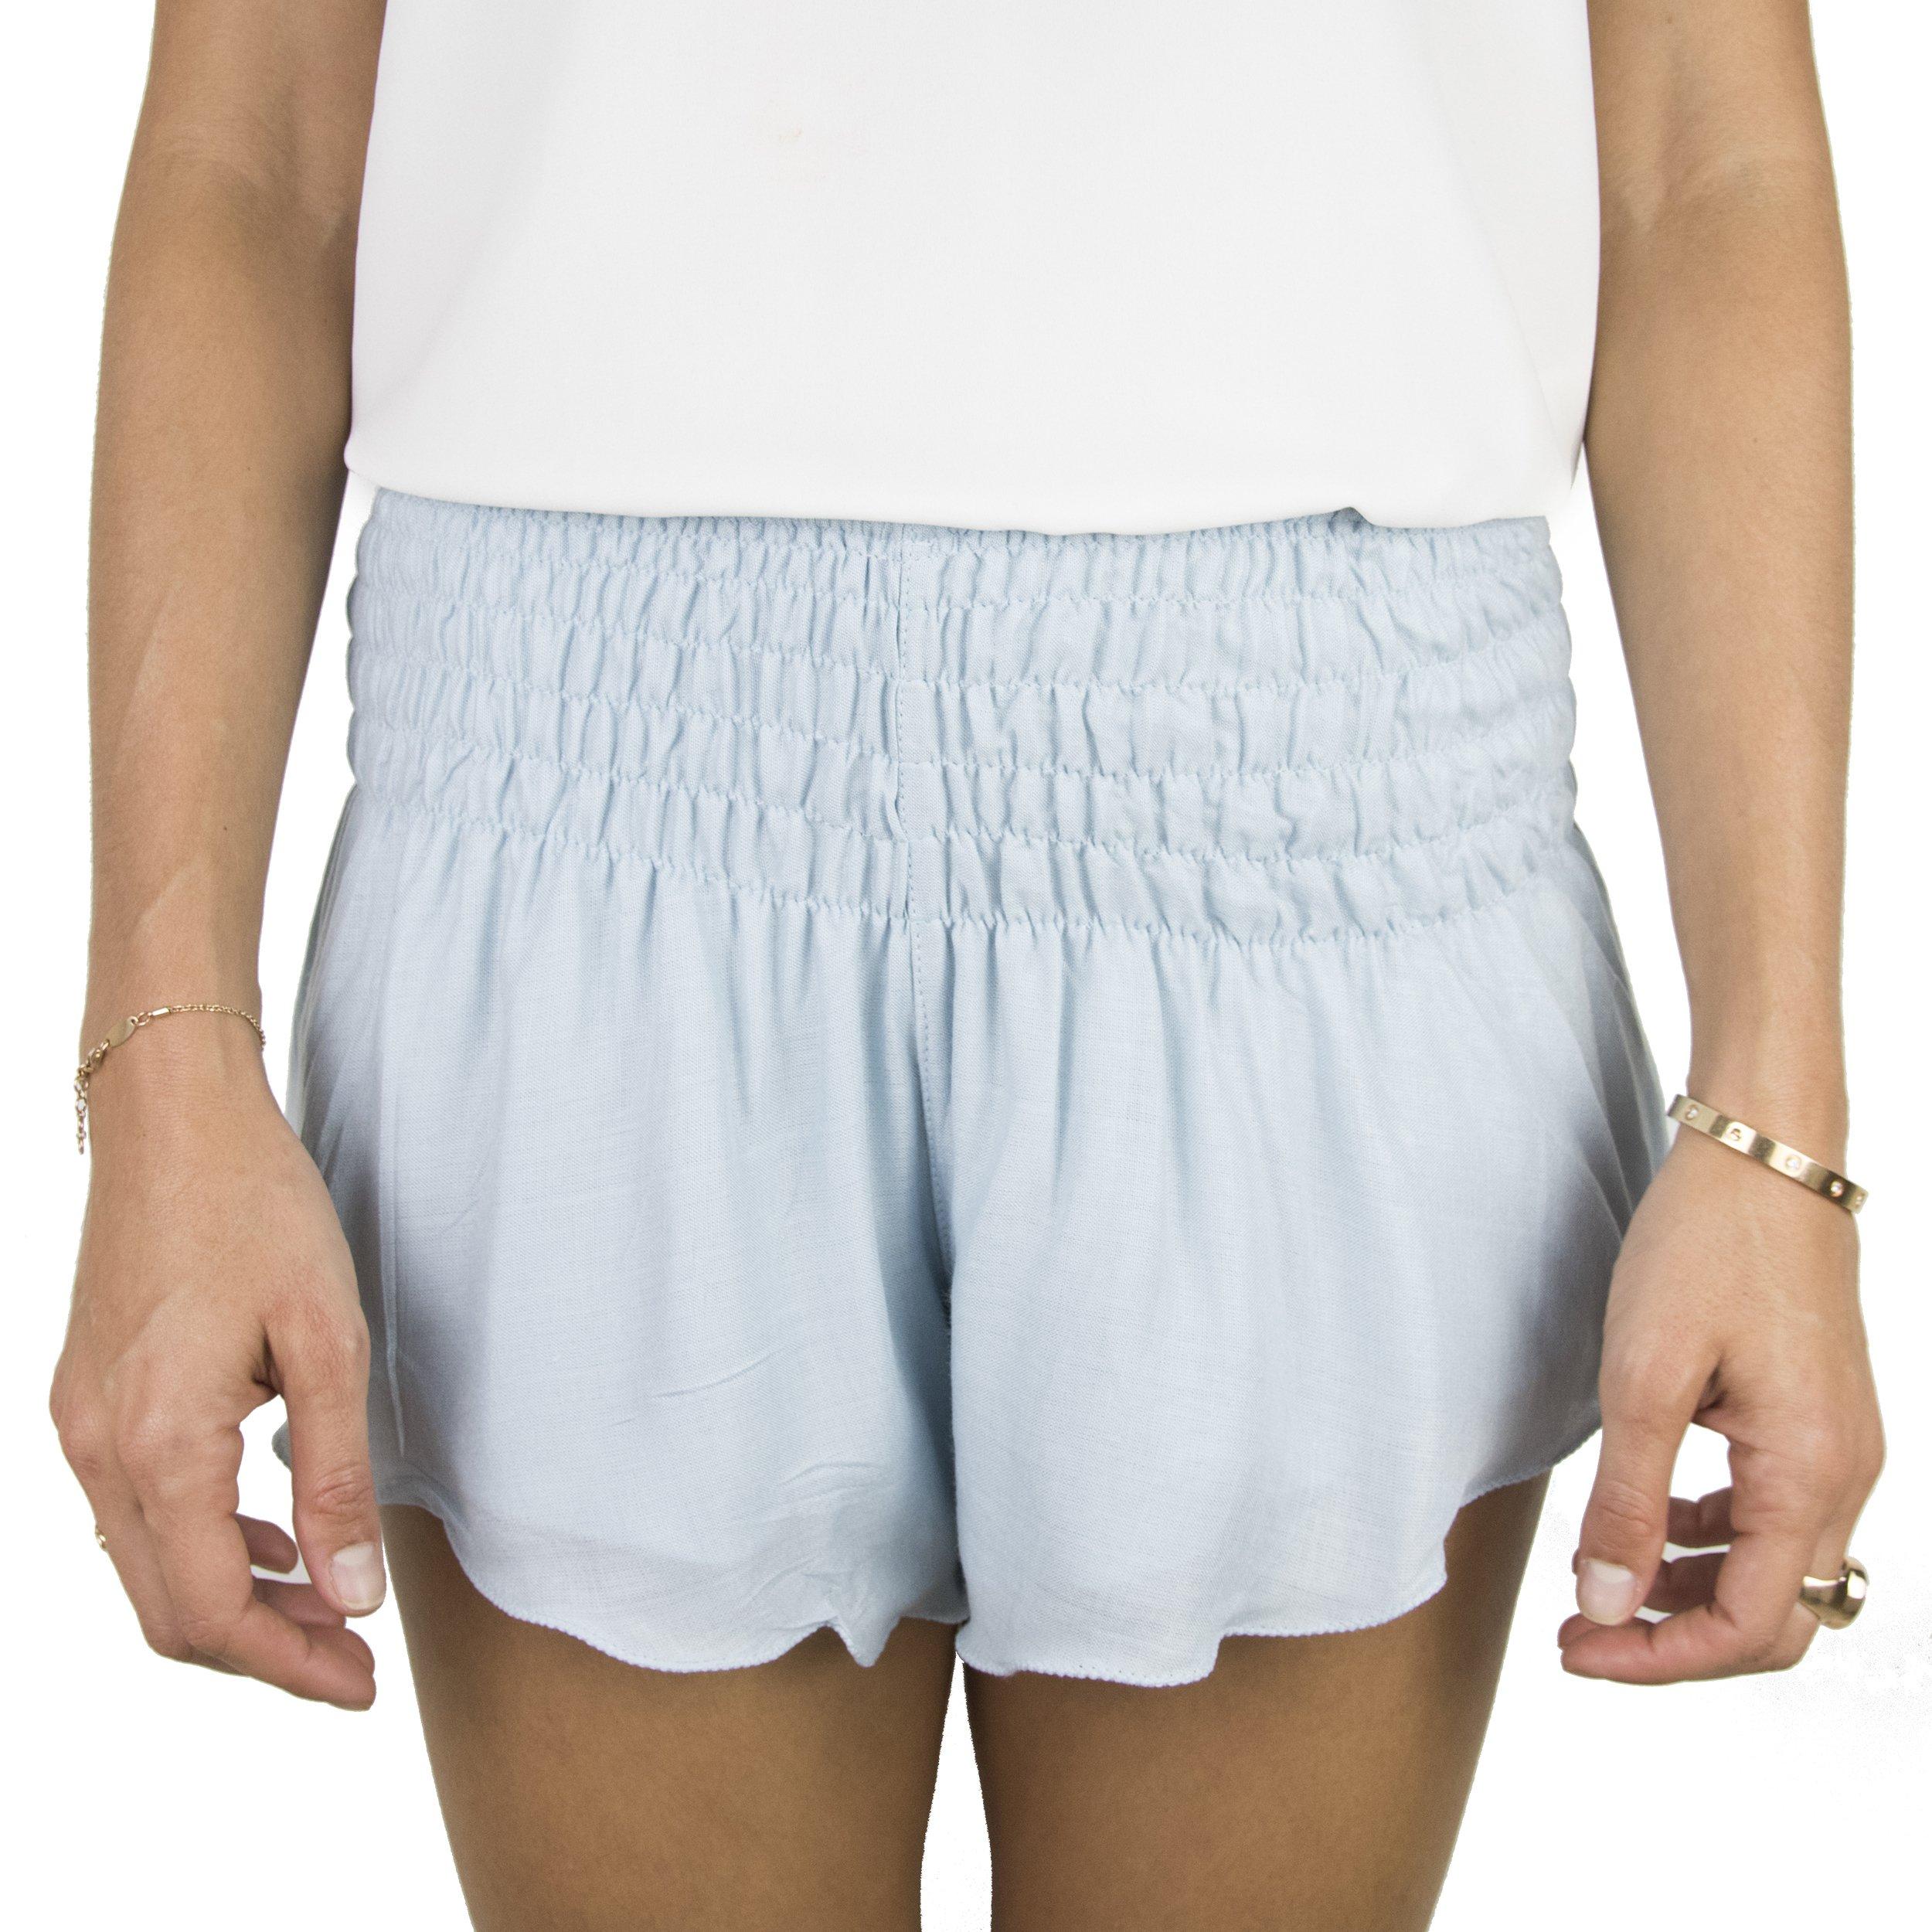 Natural Healing Co.. Beach Shorts for Women, Casual Summer Shorts, Wide Elastic Waist